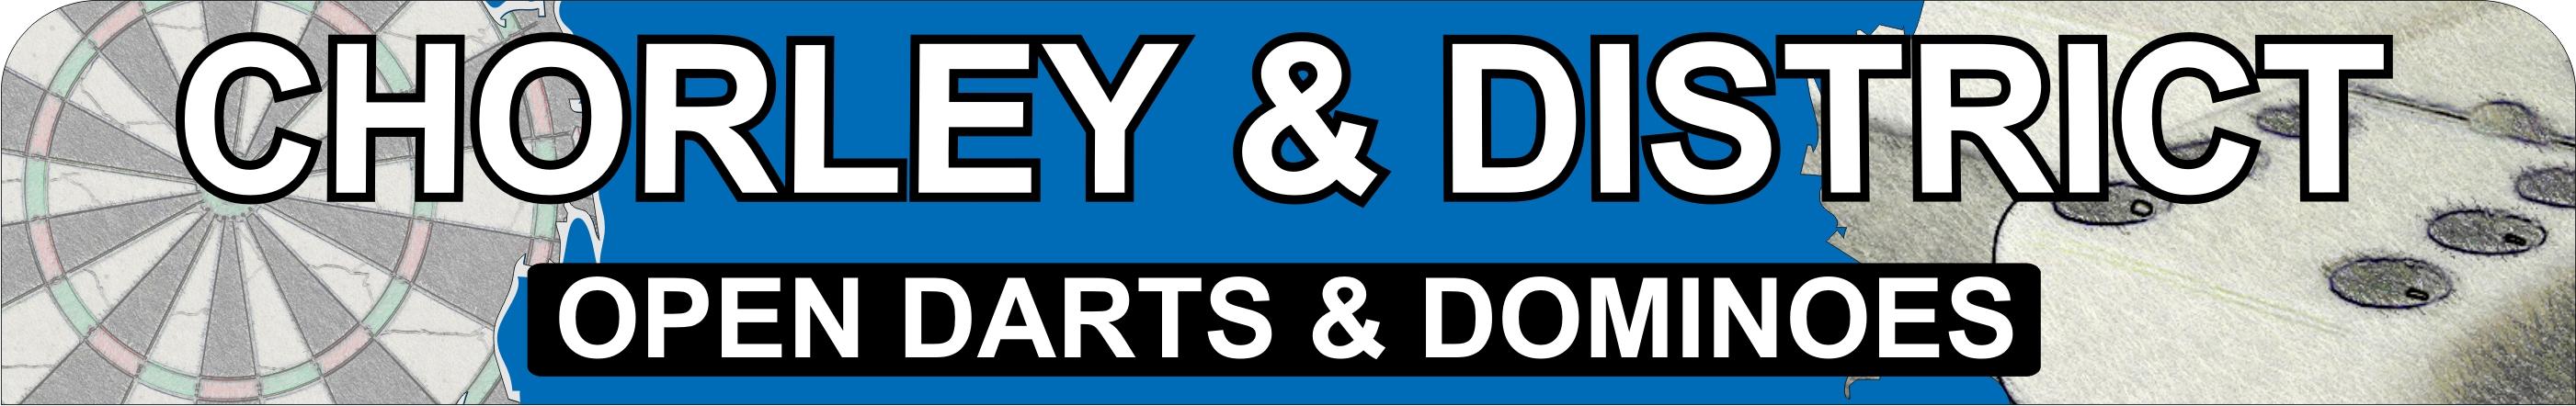 Chorley Darts Doms